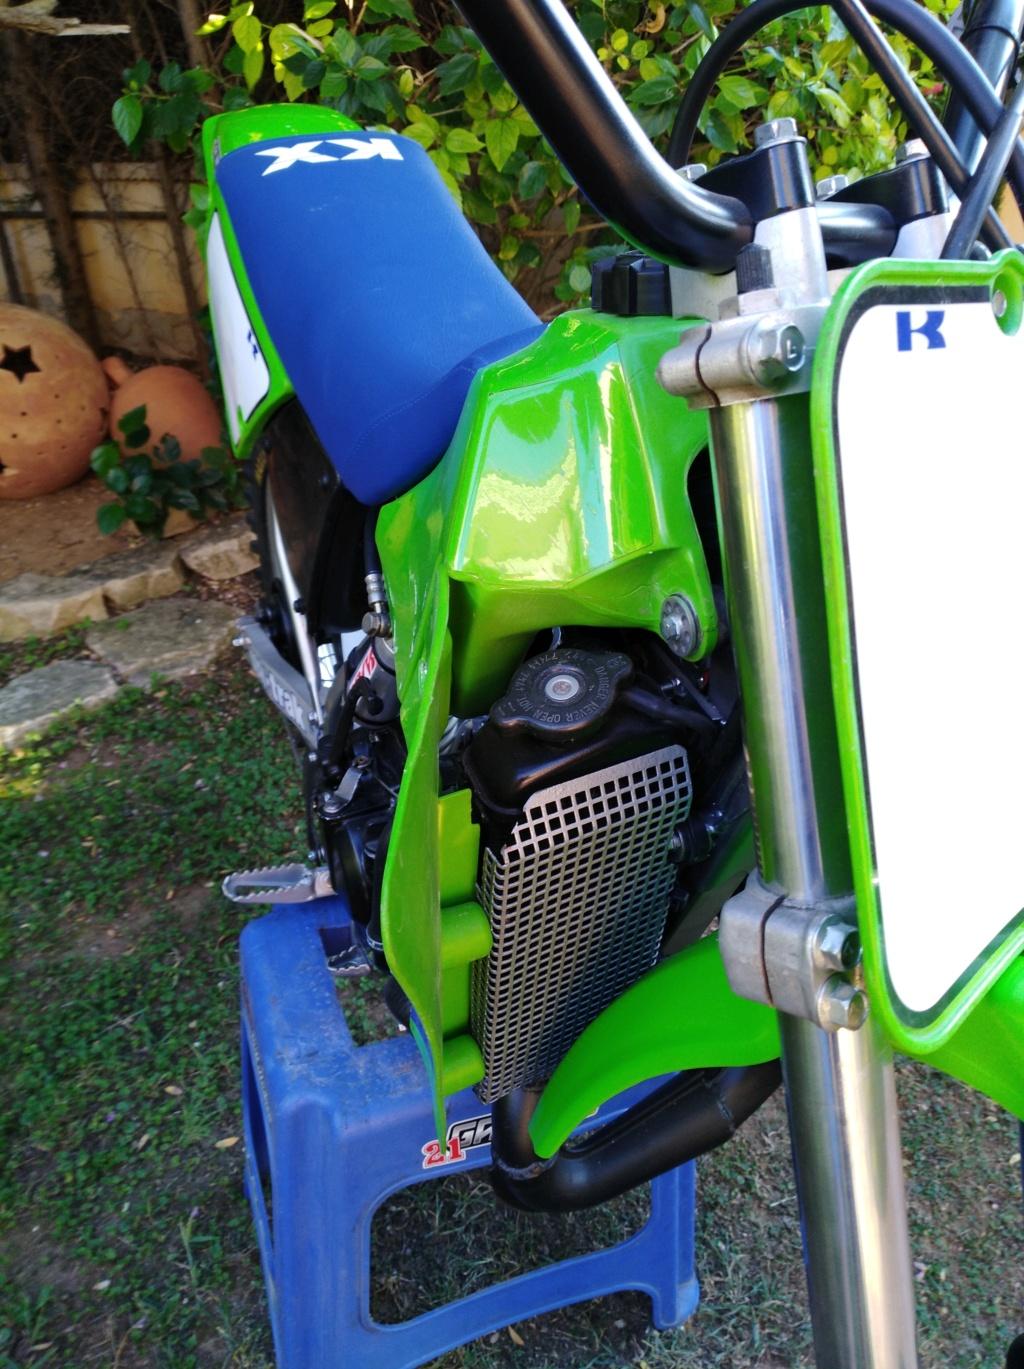 Kawasaki KX 80 1987 > Restauracion - Página 2 Img_2055